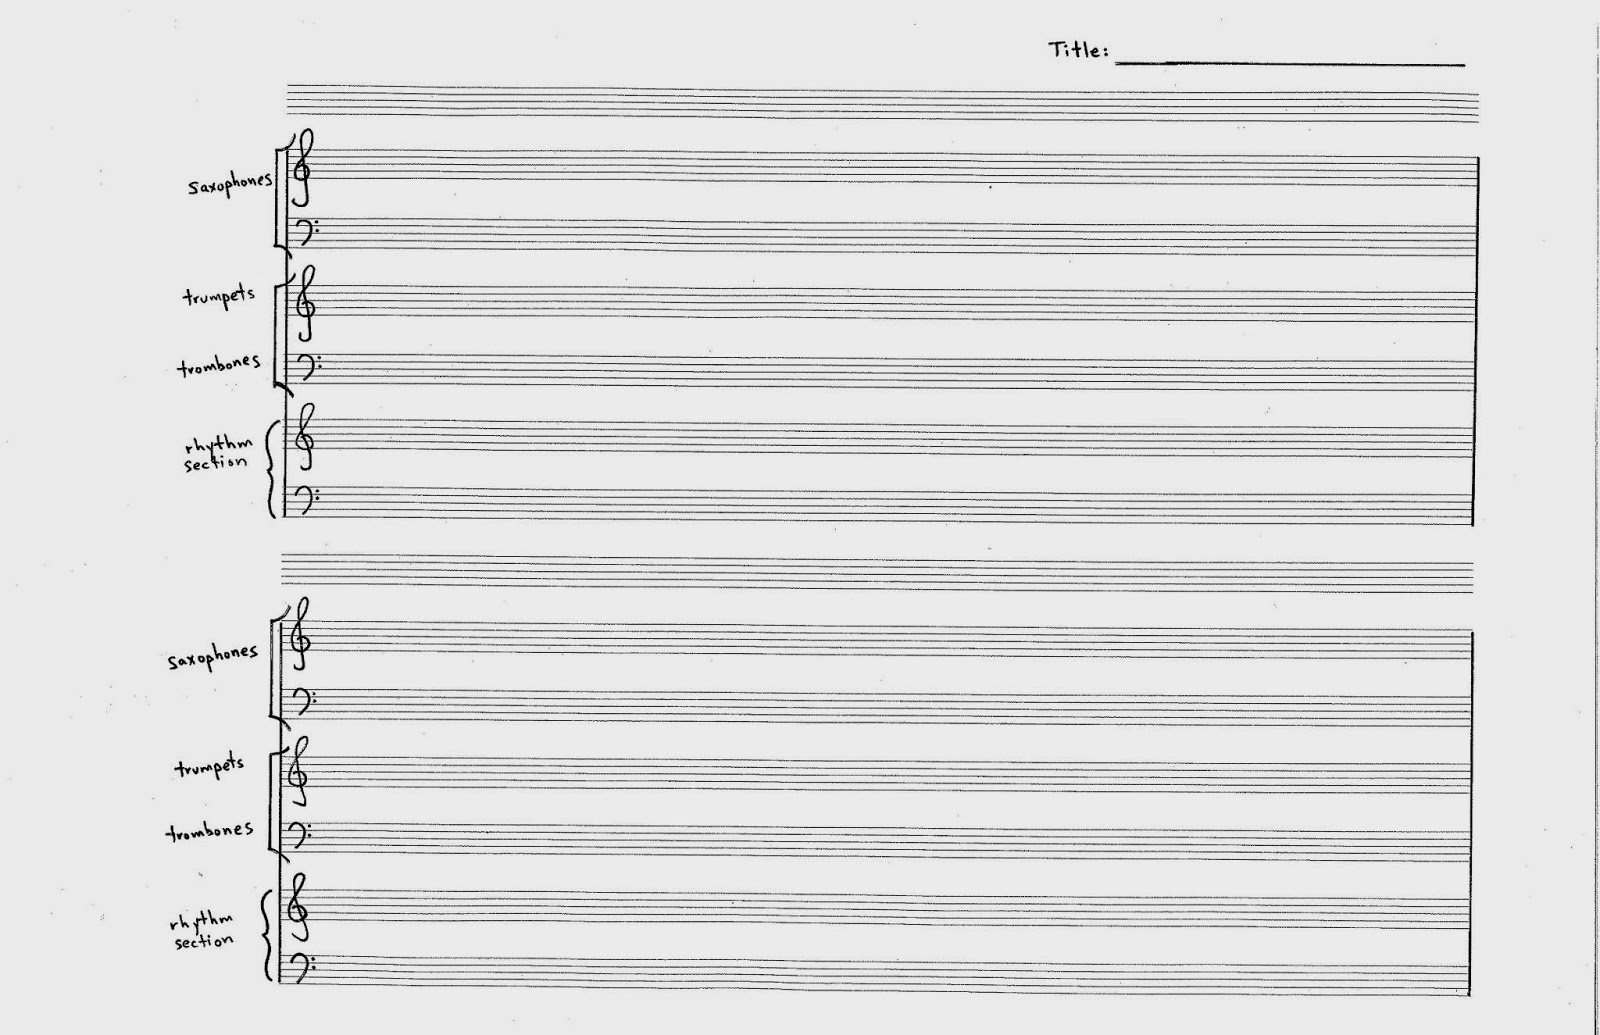 big band score paper